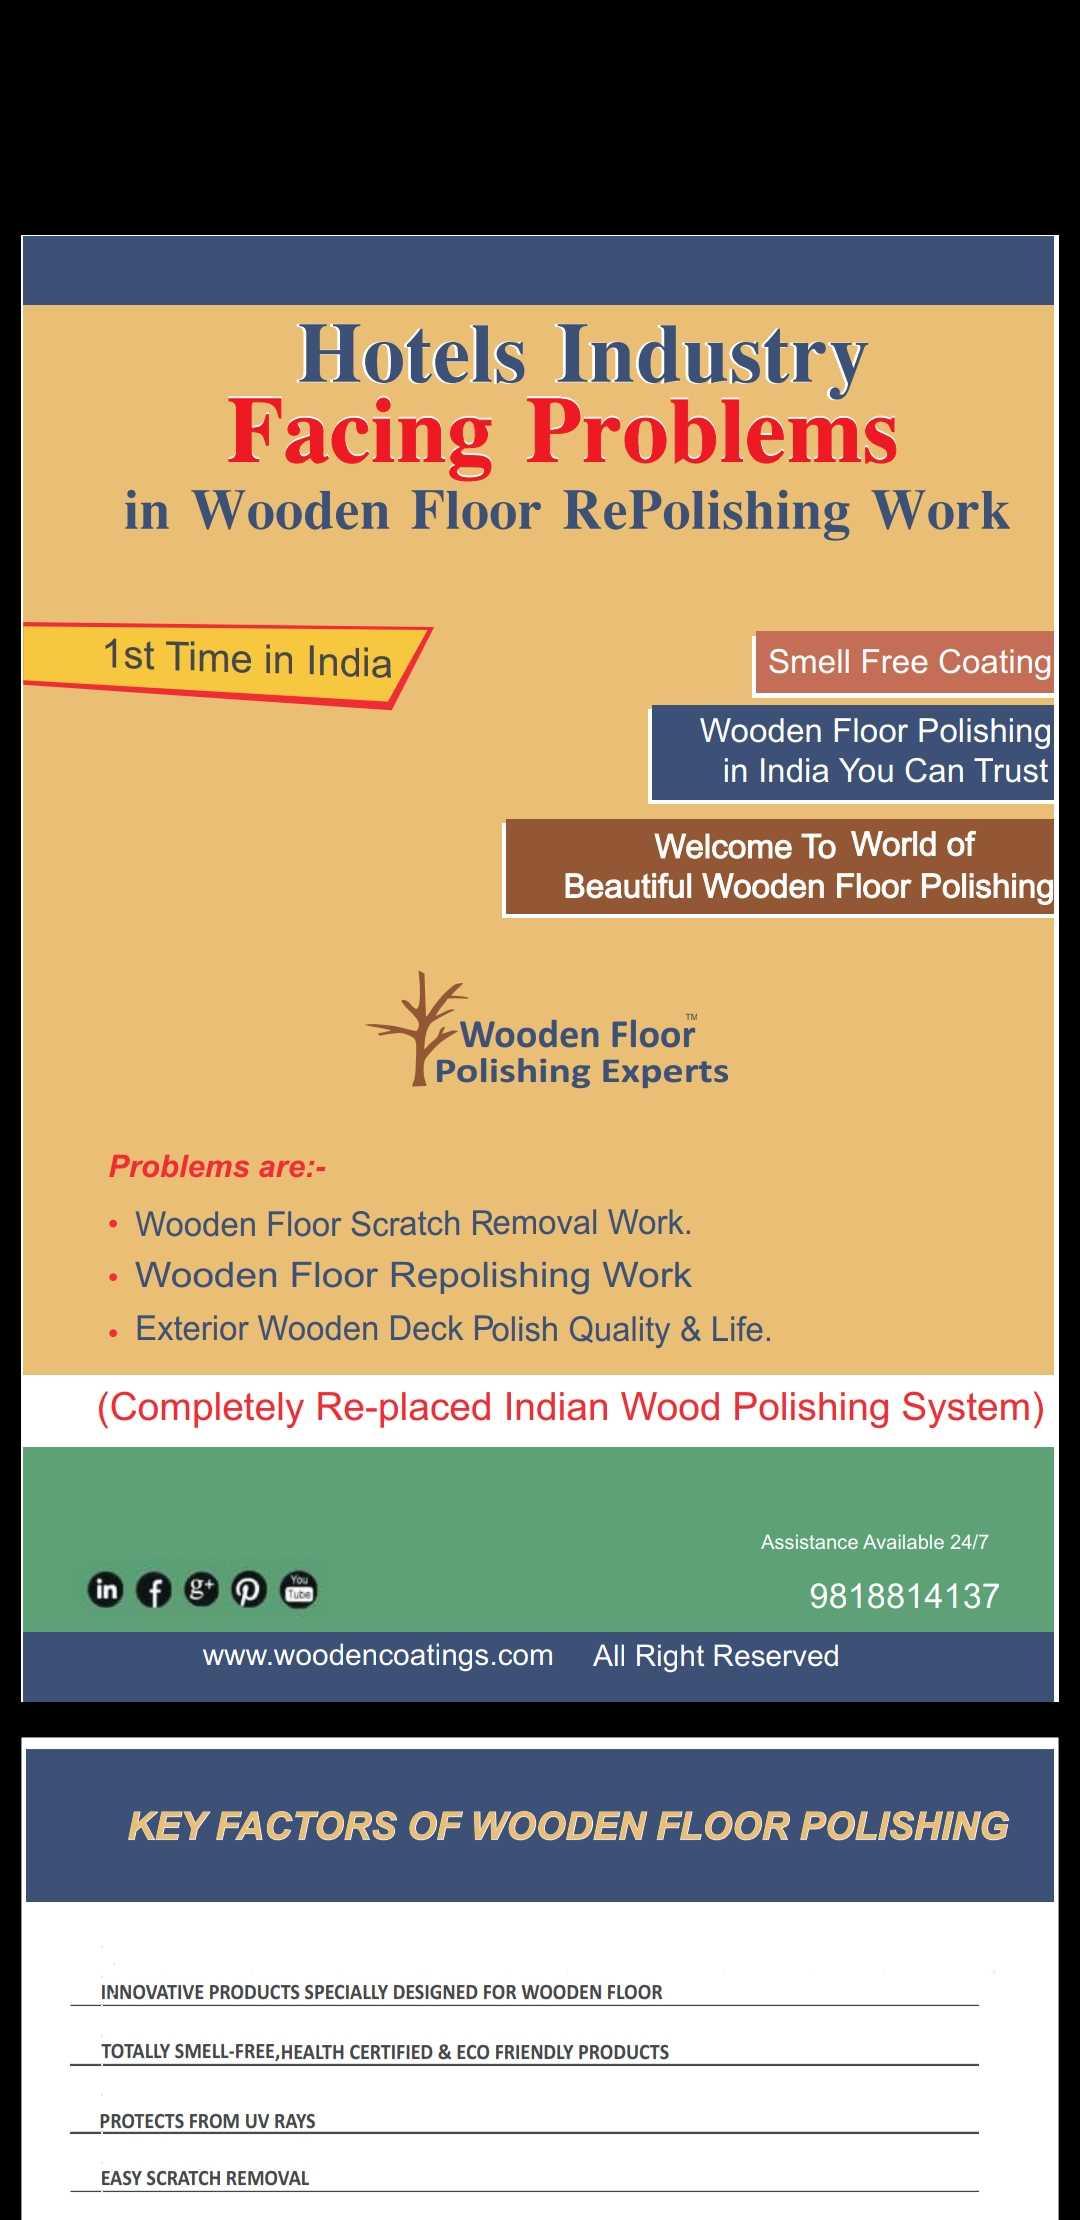 The Wood Floor Polishing Experts In Tughlakabad Delhi 110019